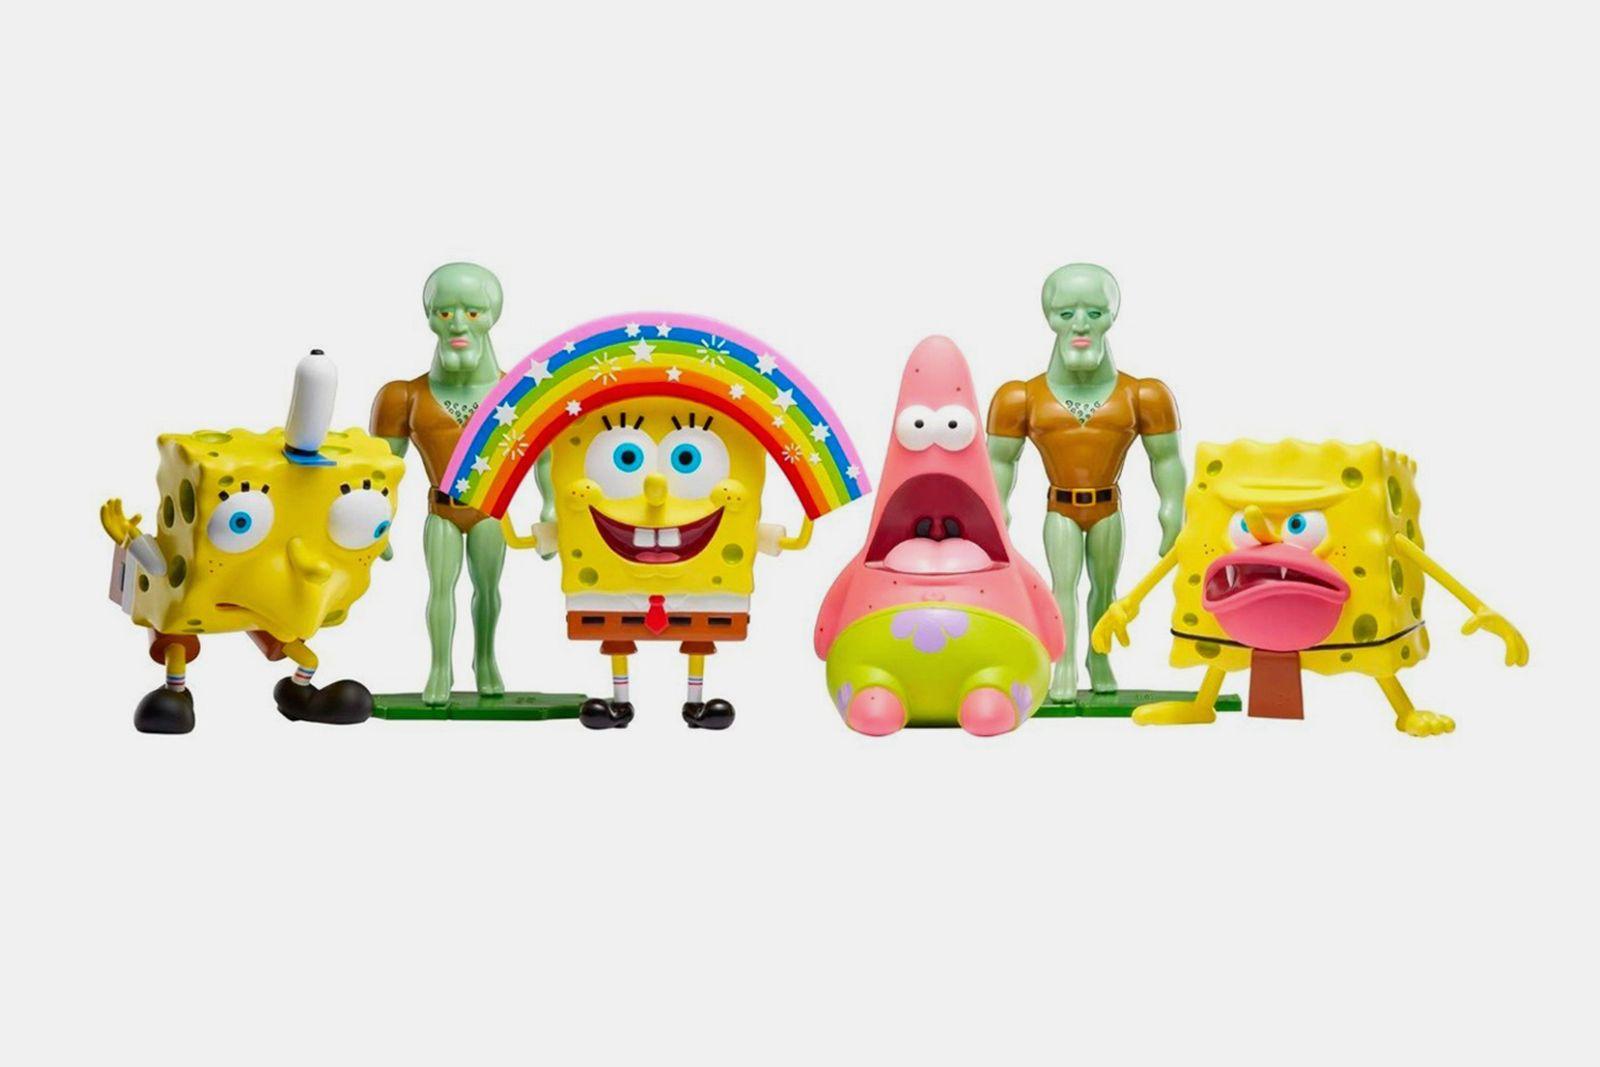 nickelodeon spongebob squarepants meme figures